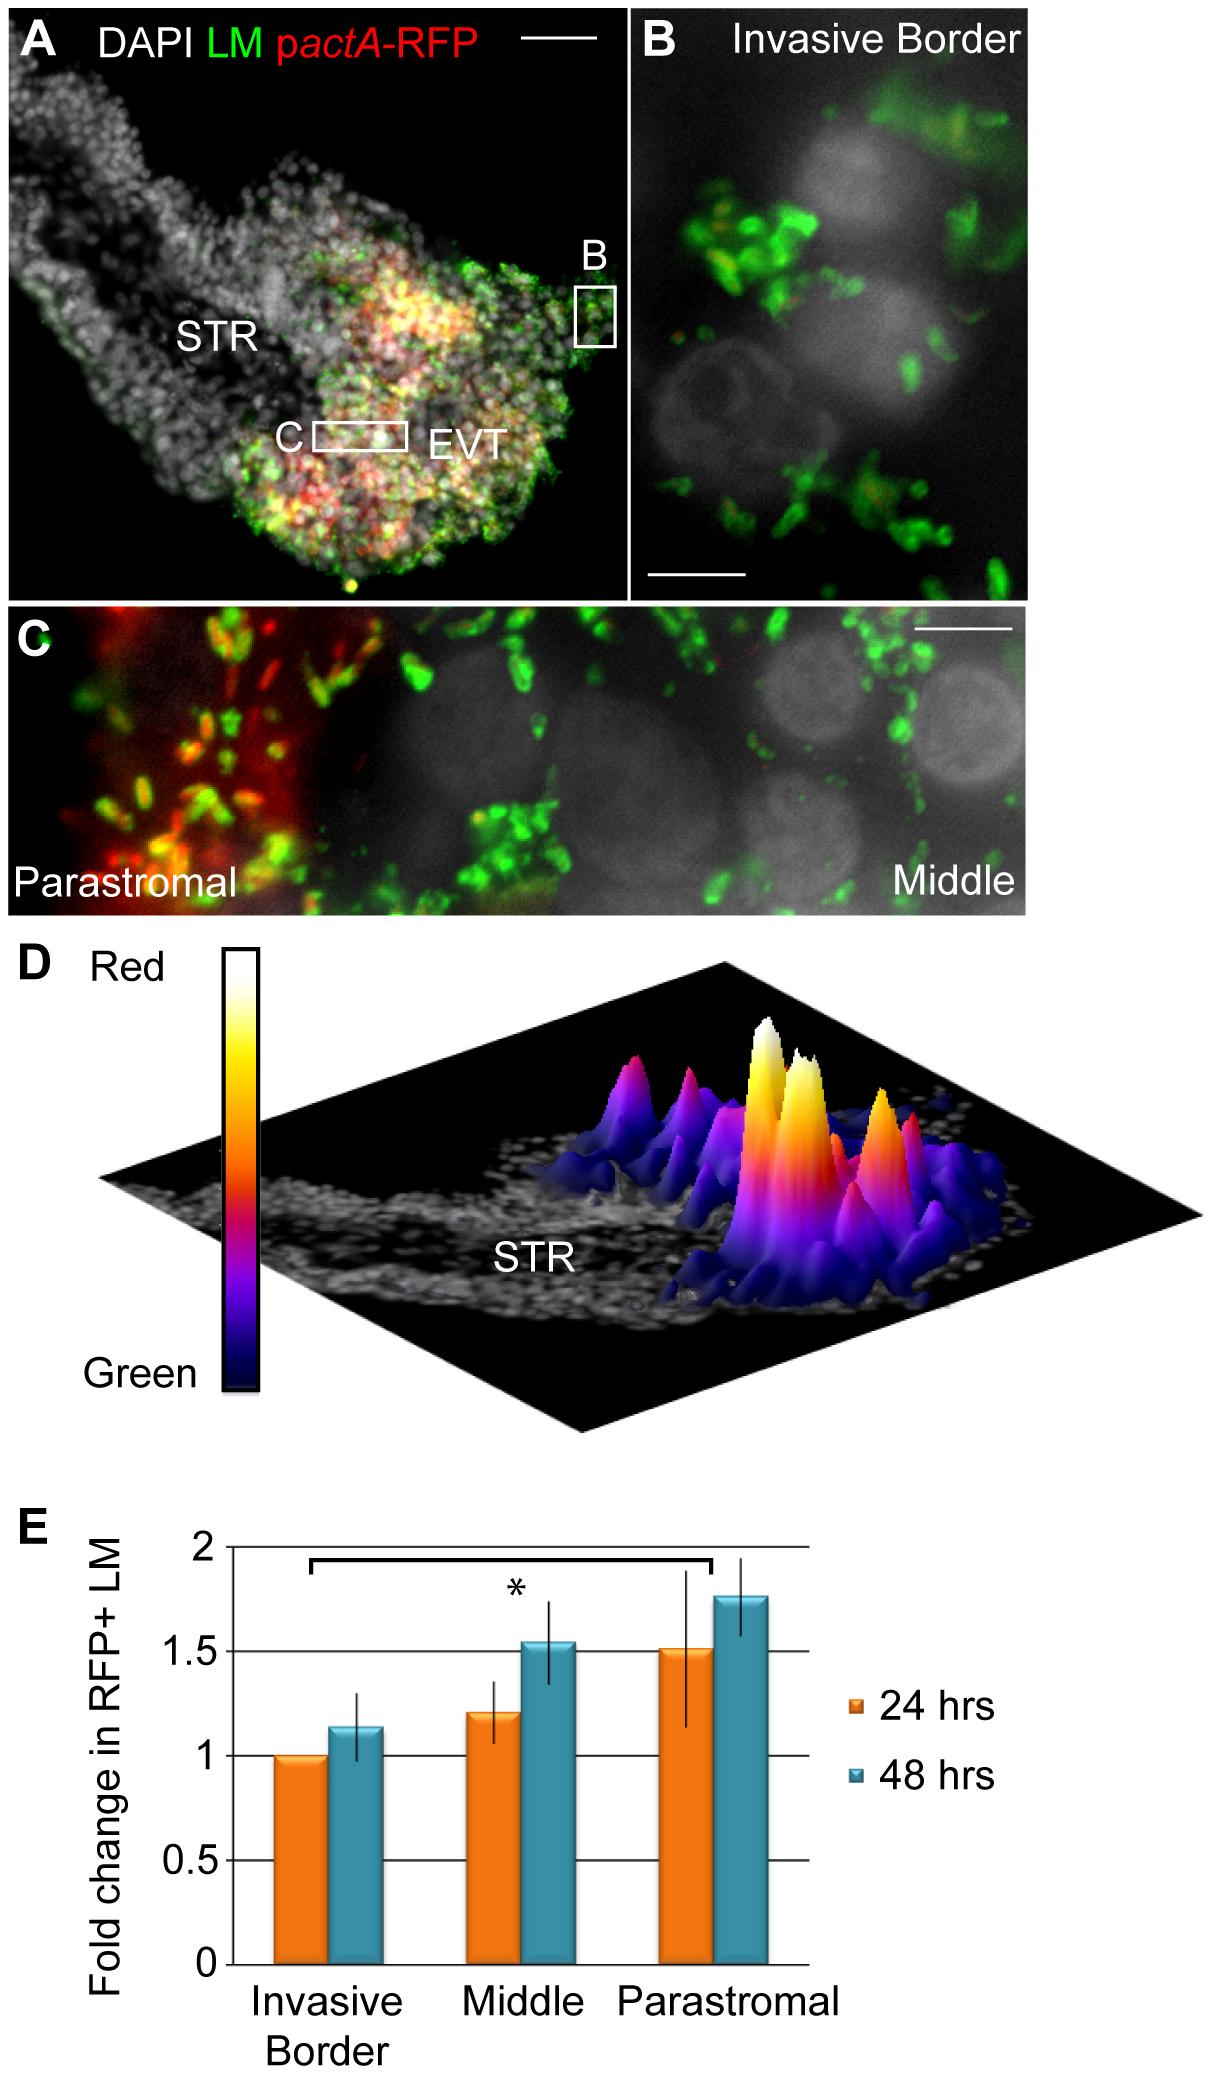 <i>L. monocytogenes</i> (LM) vacuolar escape rates vary across subpopulations of trophoblasts.